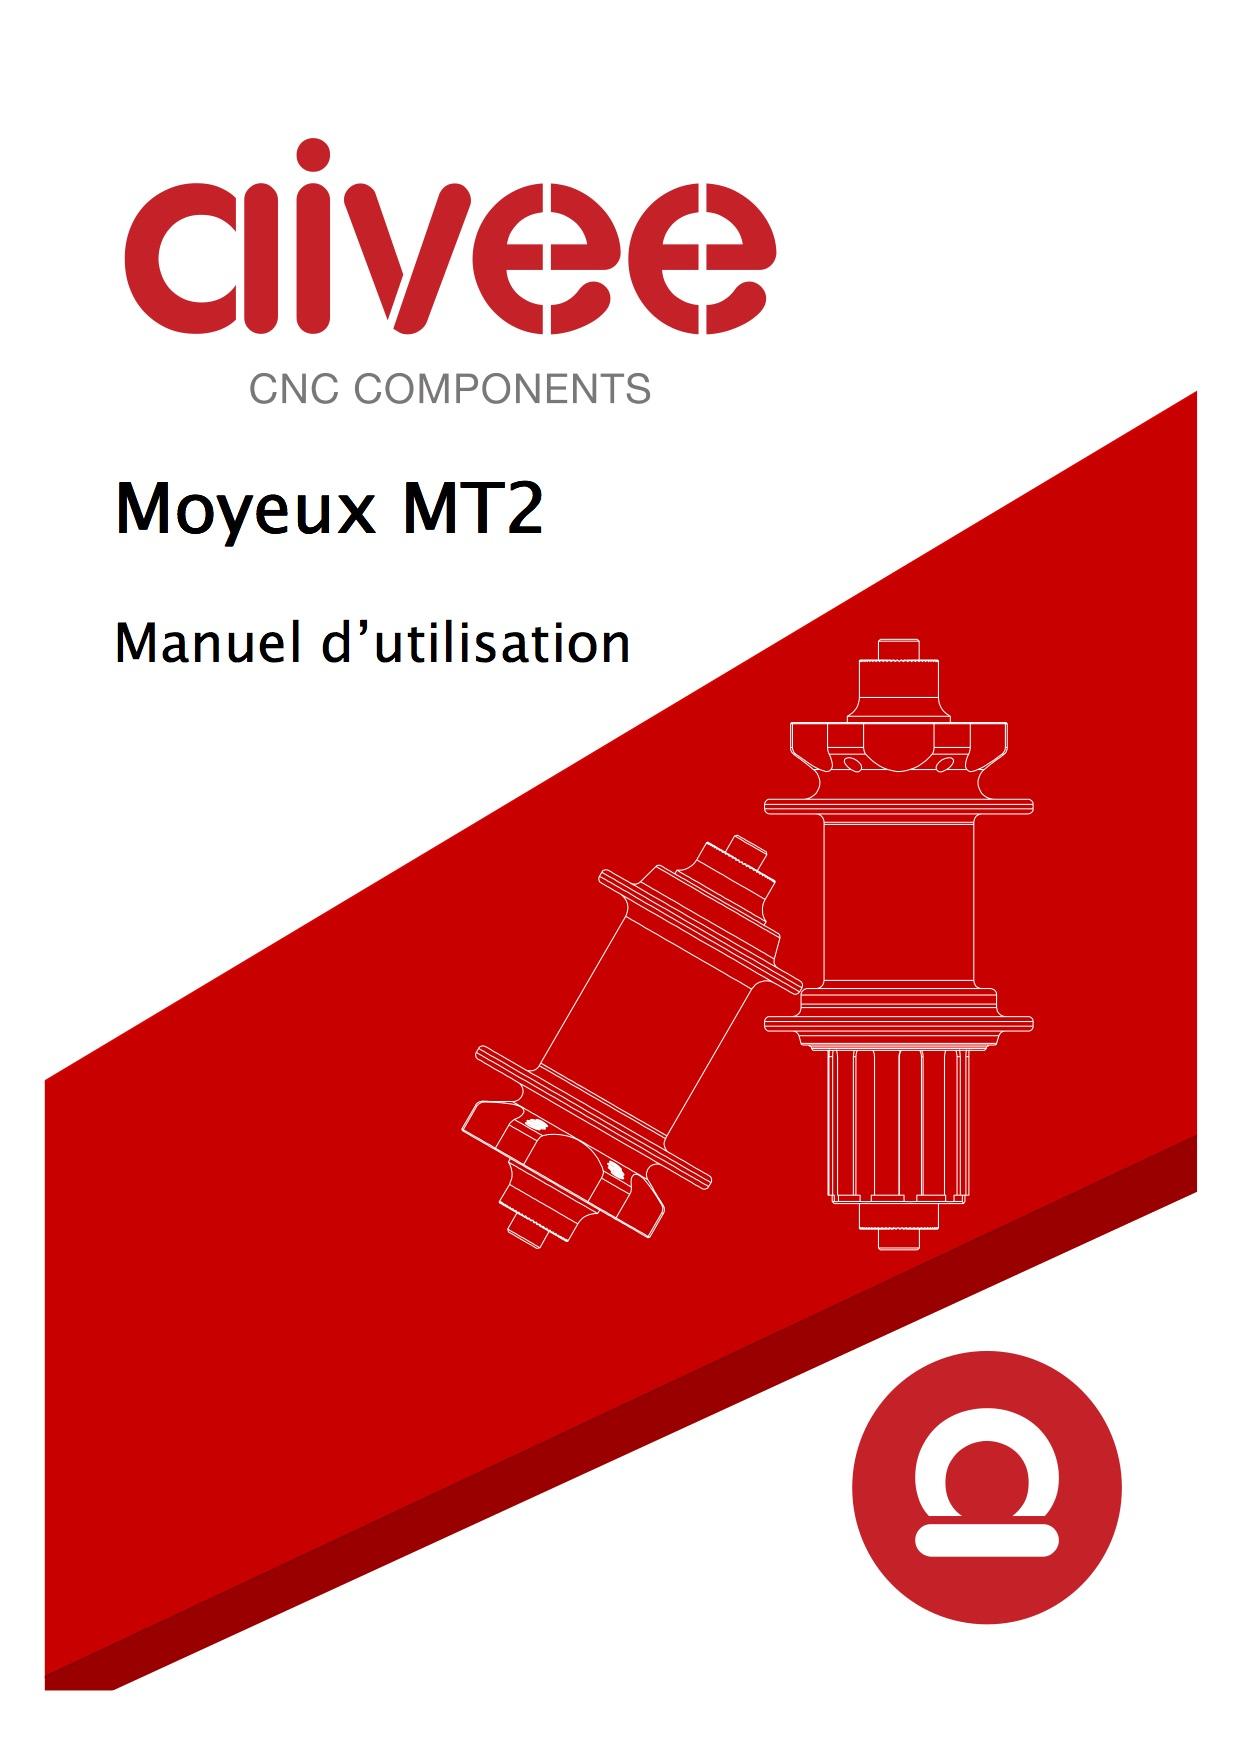 Aivee_MT2_Manuel_dutilisation .jpg